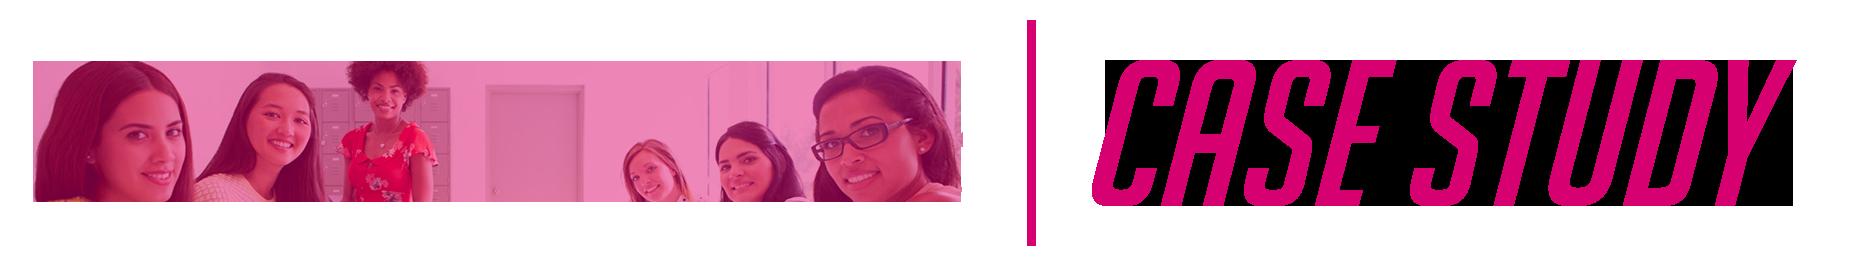 SC-workwidewomen-Case-Study-Logo